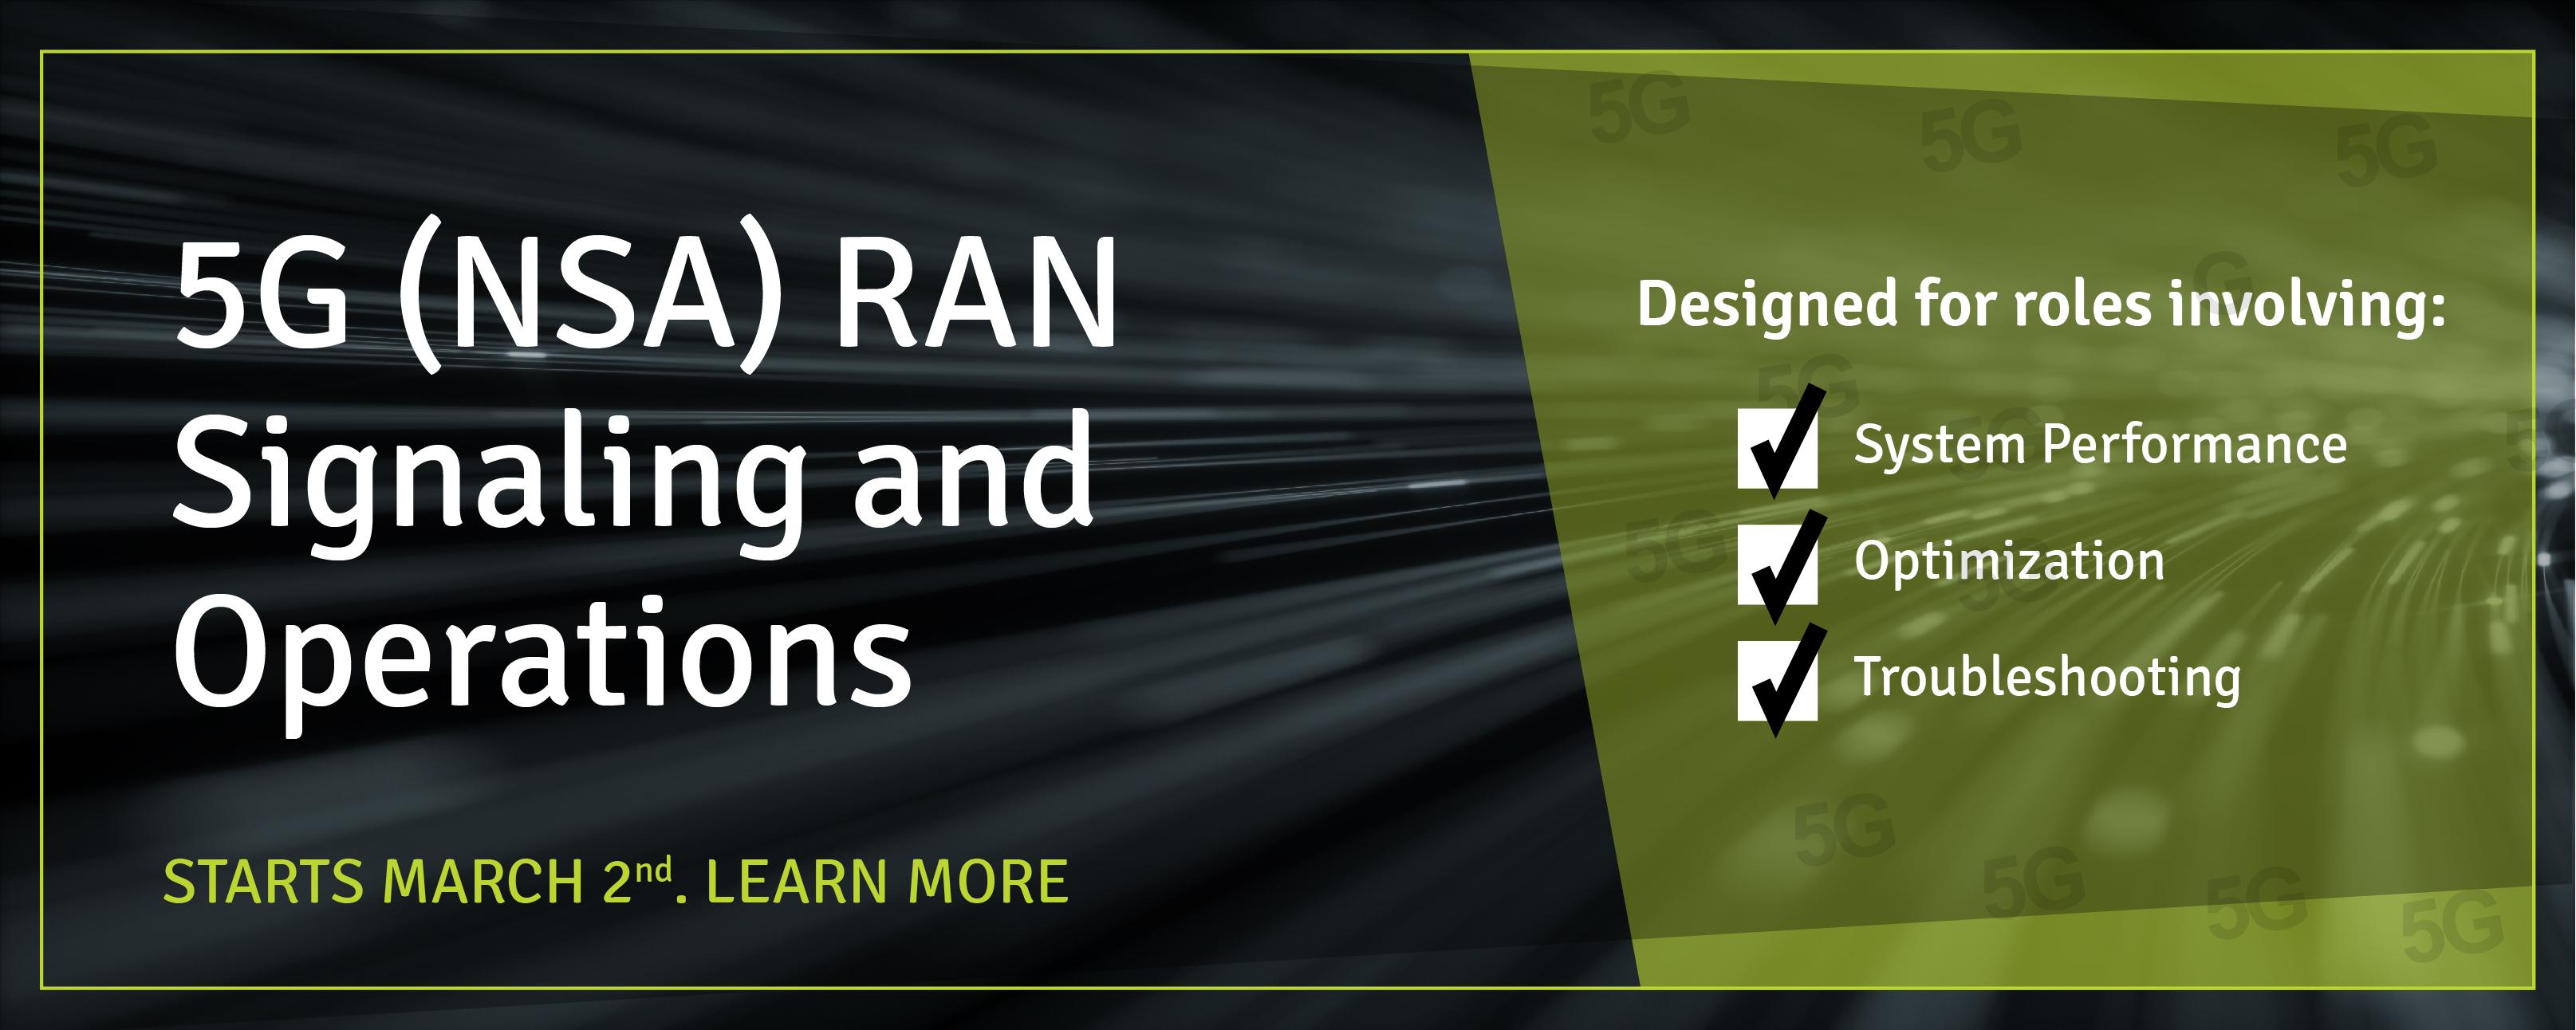 5G RAN S&O 775 x 150 banner ad-01.jpg